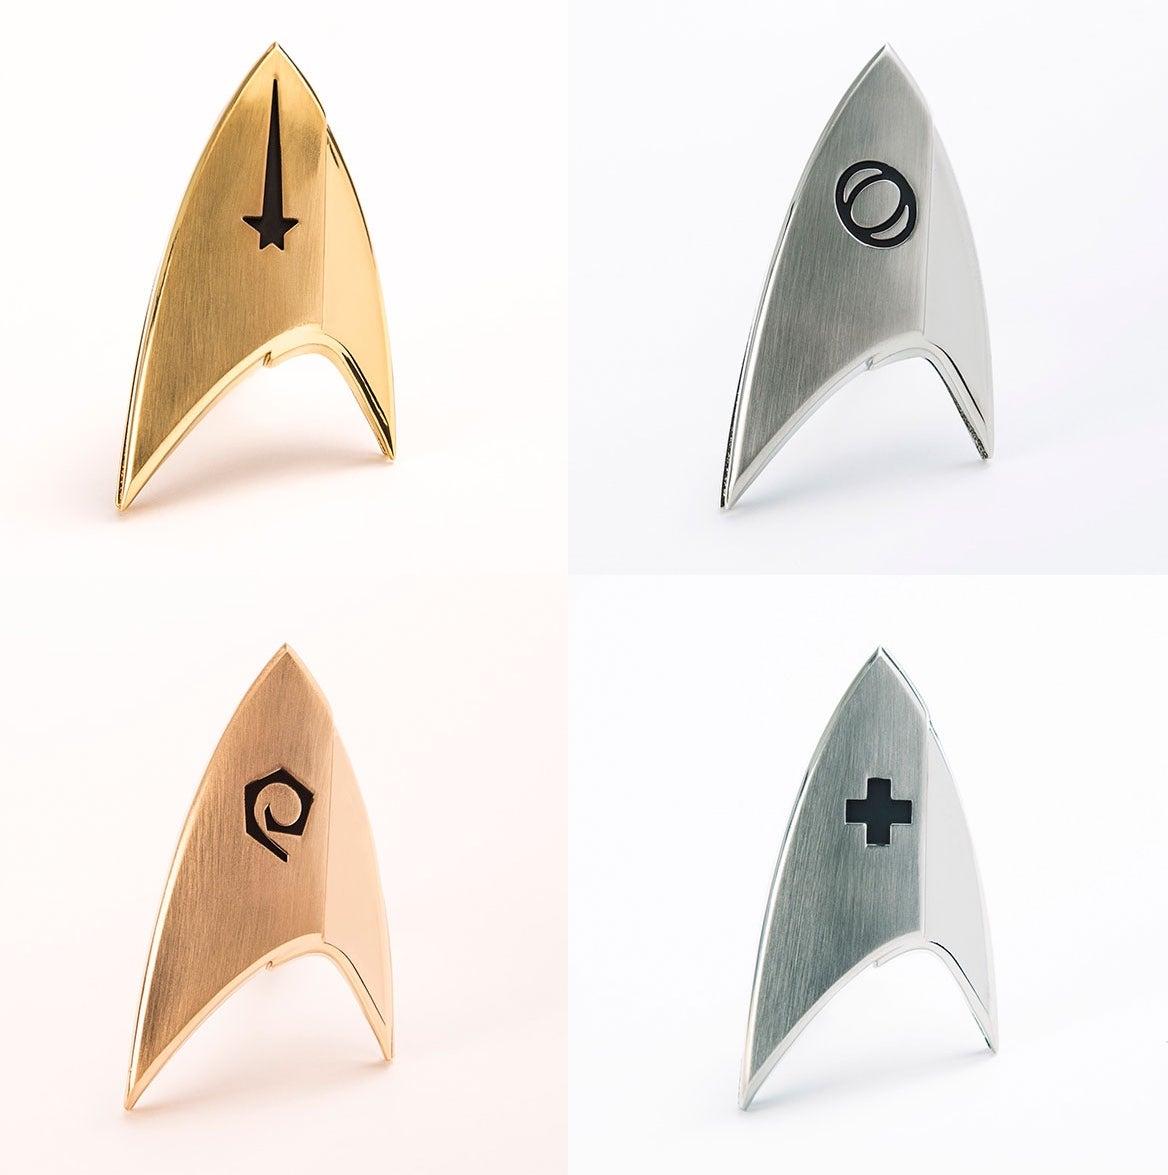 star-trek-discovery-badges